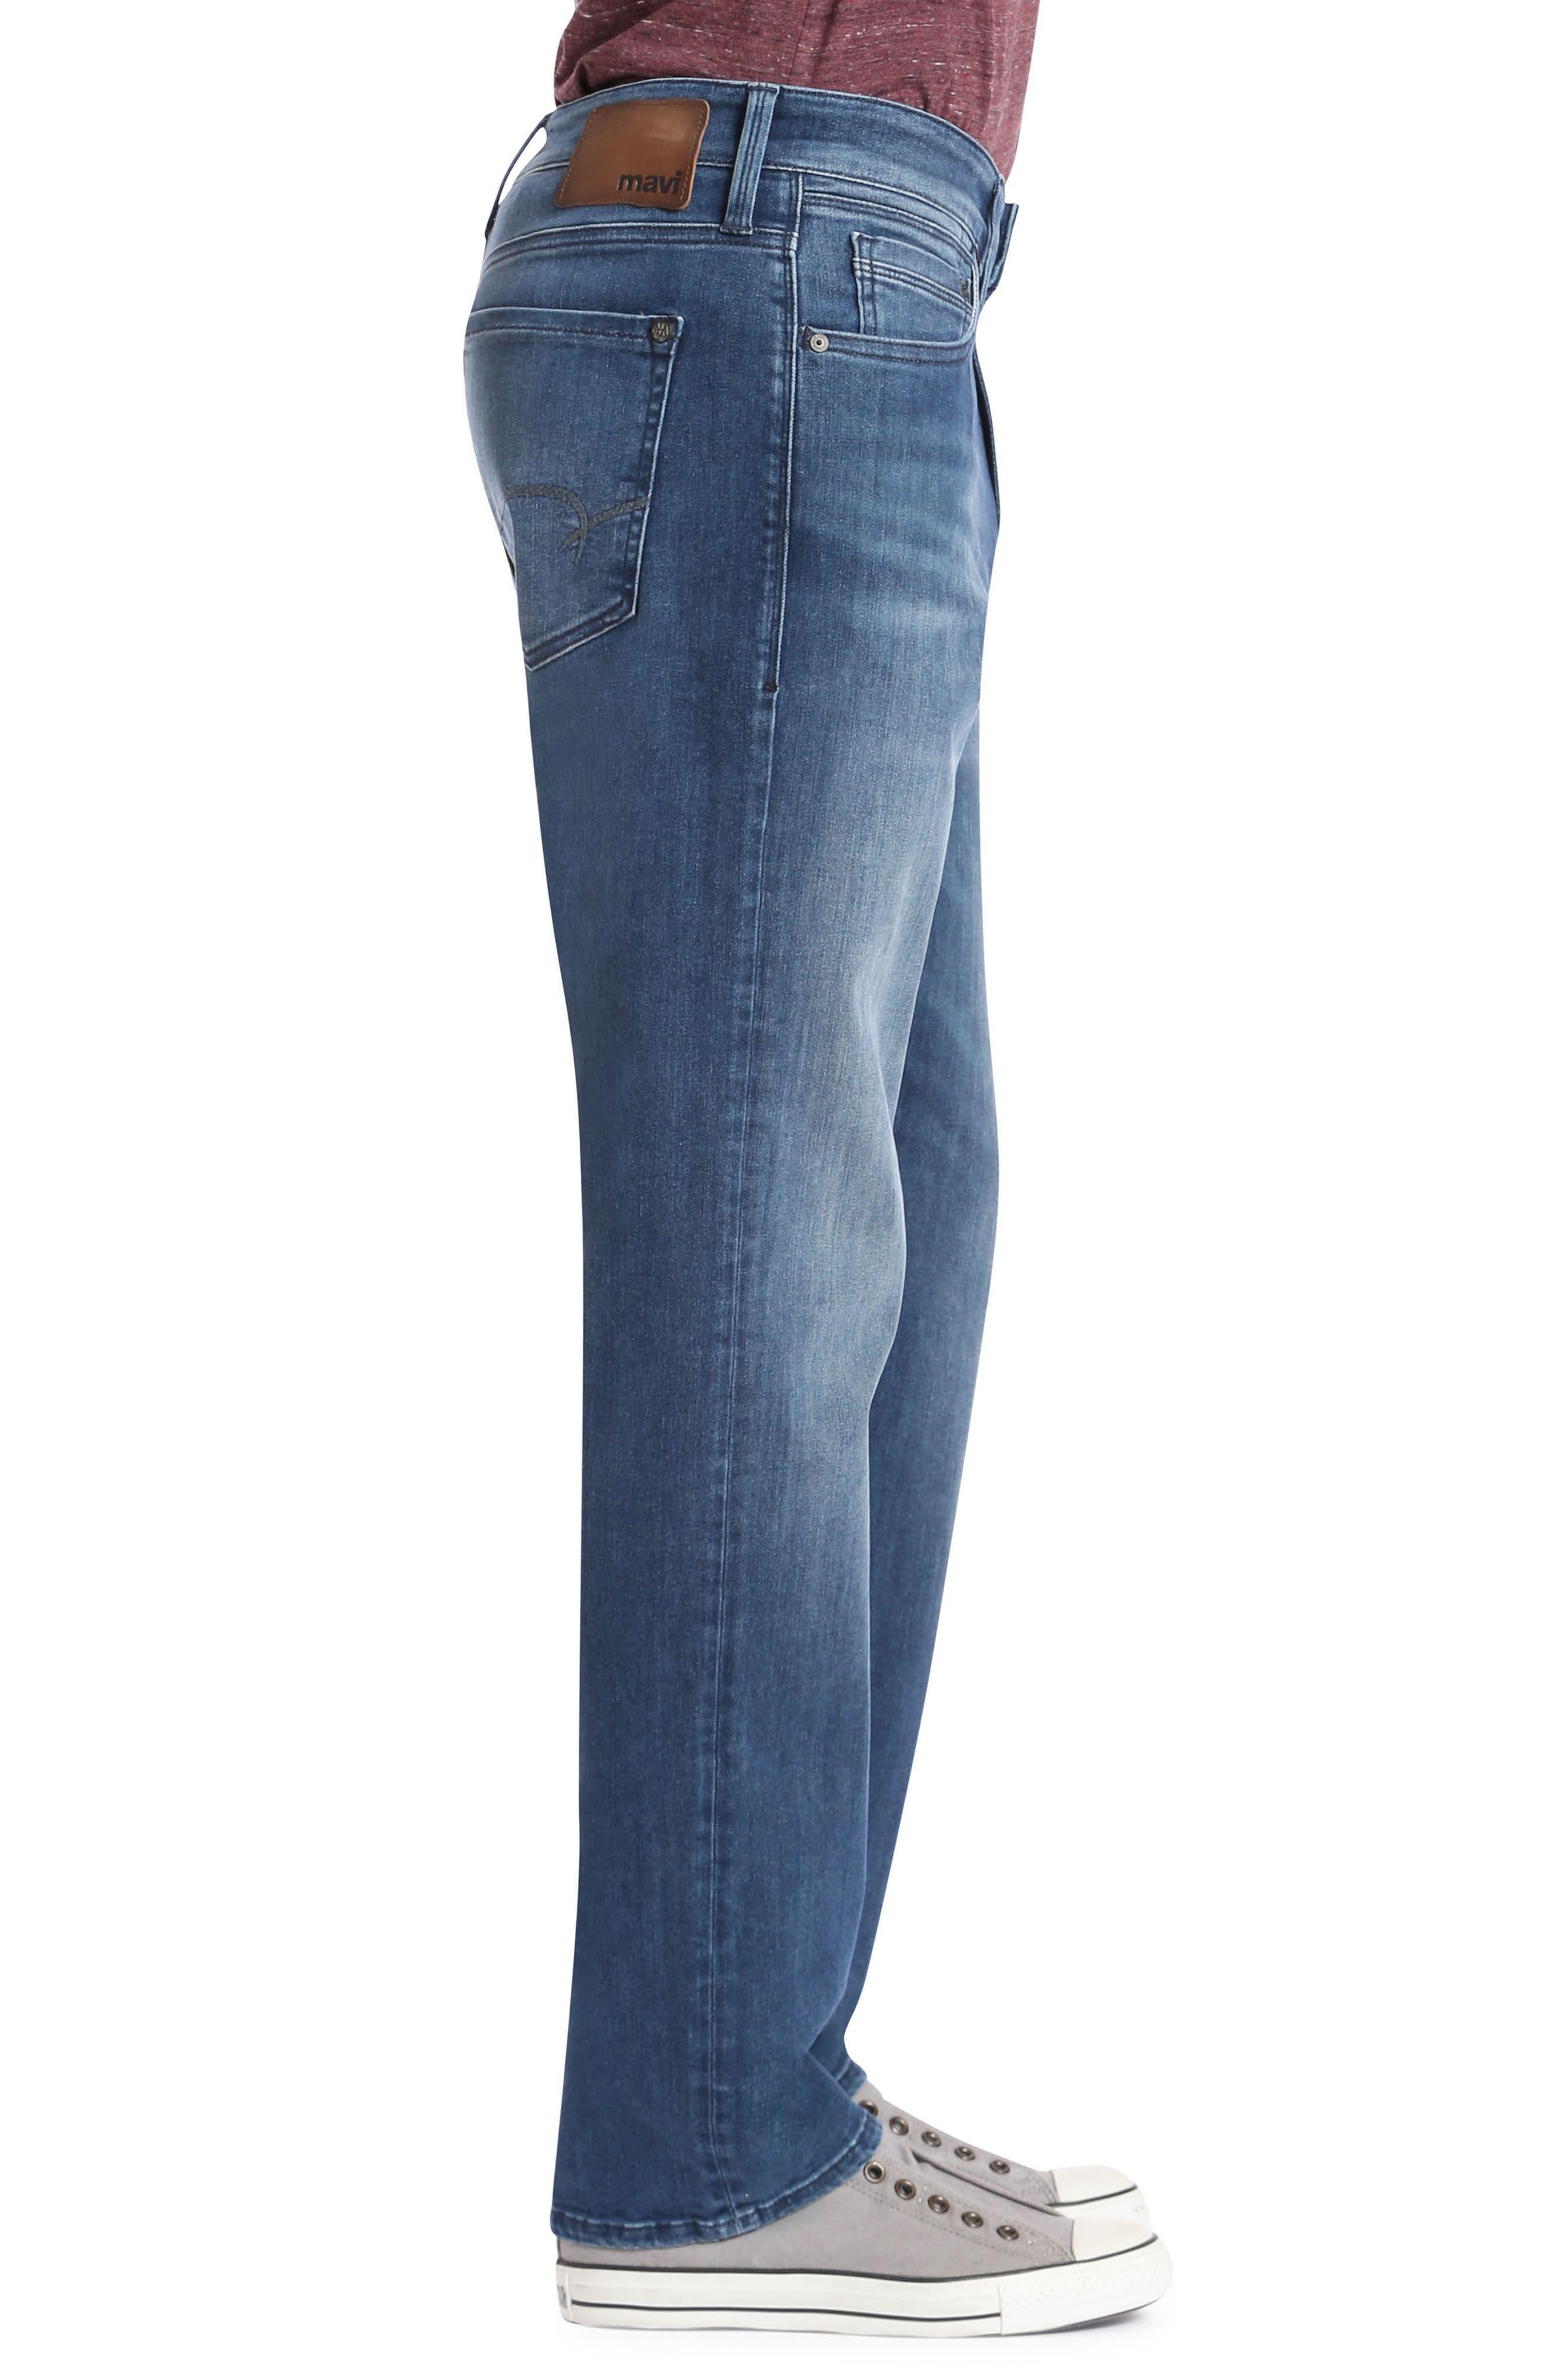 Myles Straight Leg Jeans,                             Alternate thumbnail 3, color,                             Mid Tonal Williamsburg